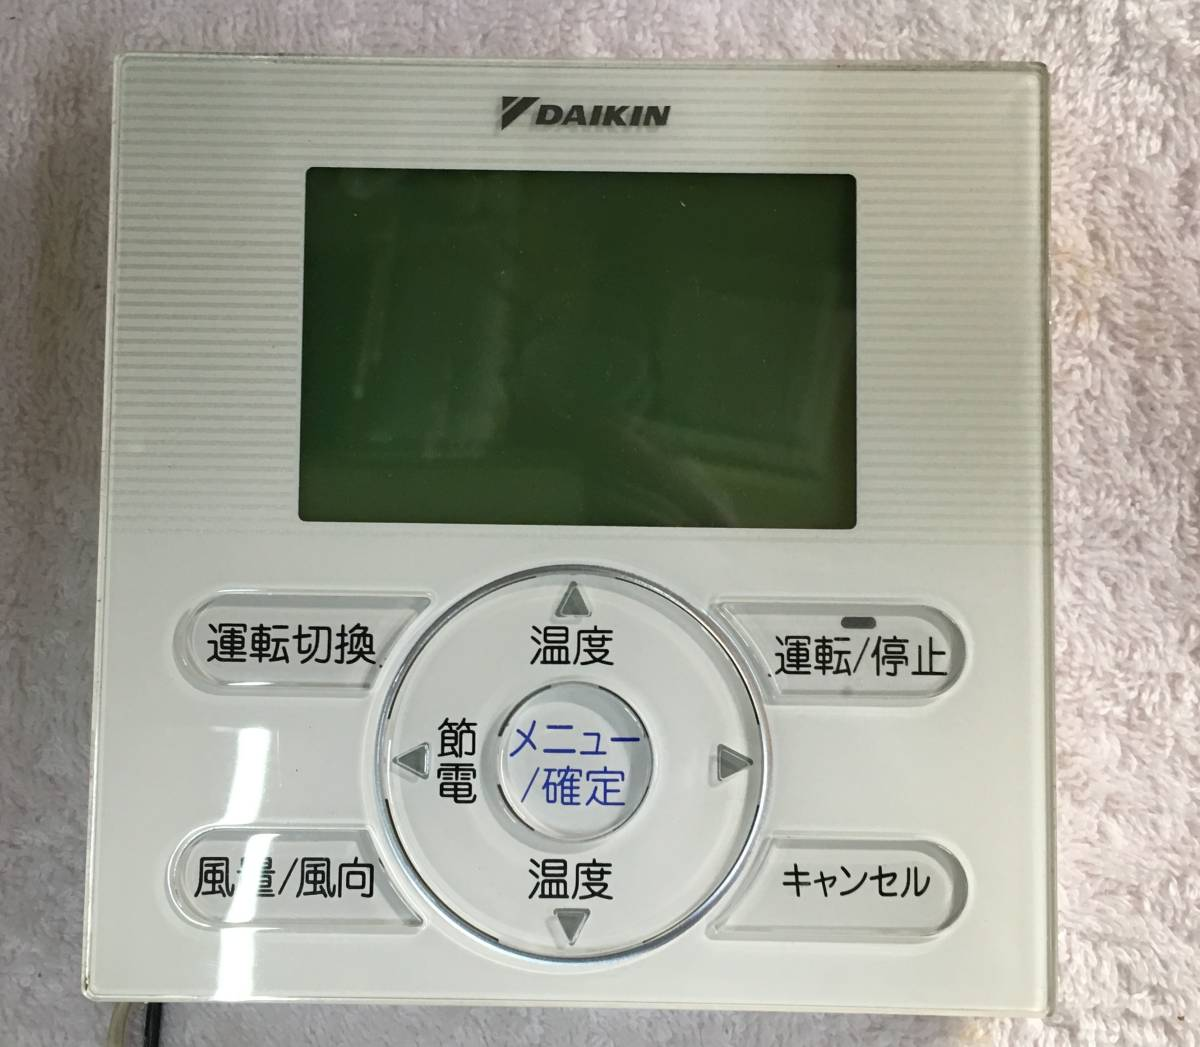 DAIKIN ダイキン 業務用エアコン EcoZEAS 天カセット4方向 1,5馬力 2016年製!!_画像10